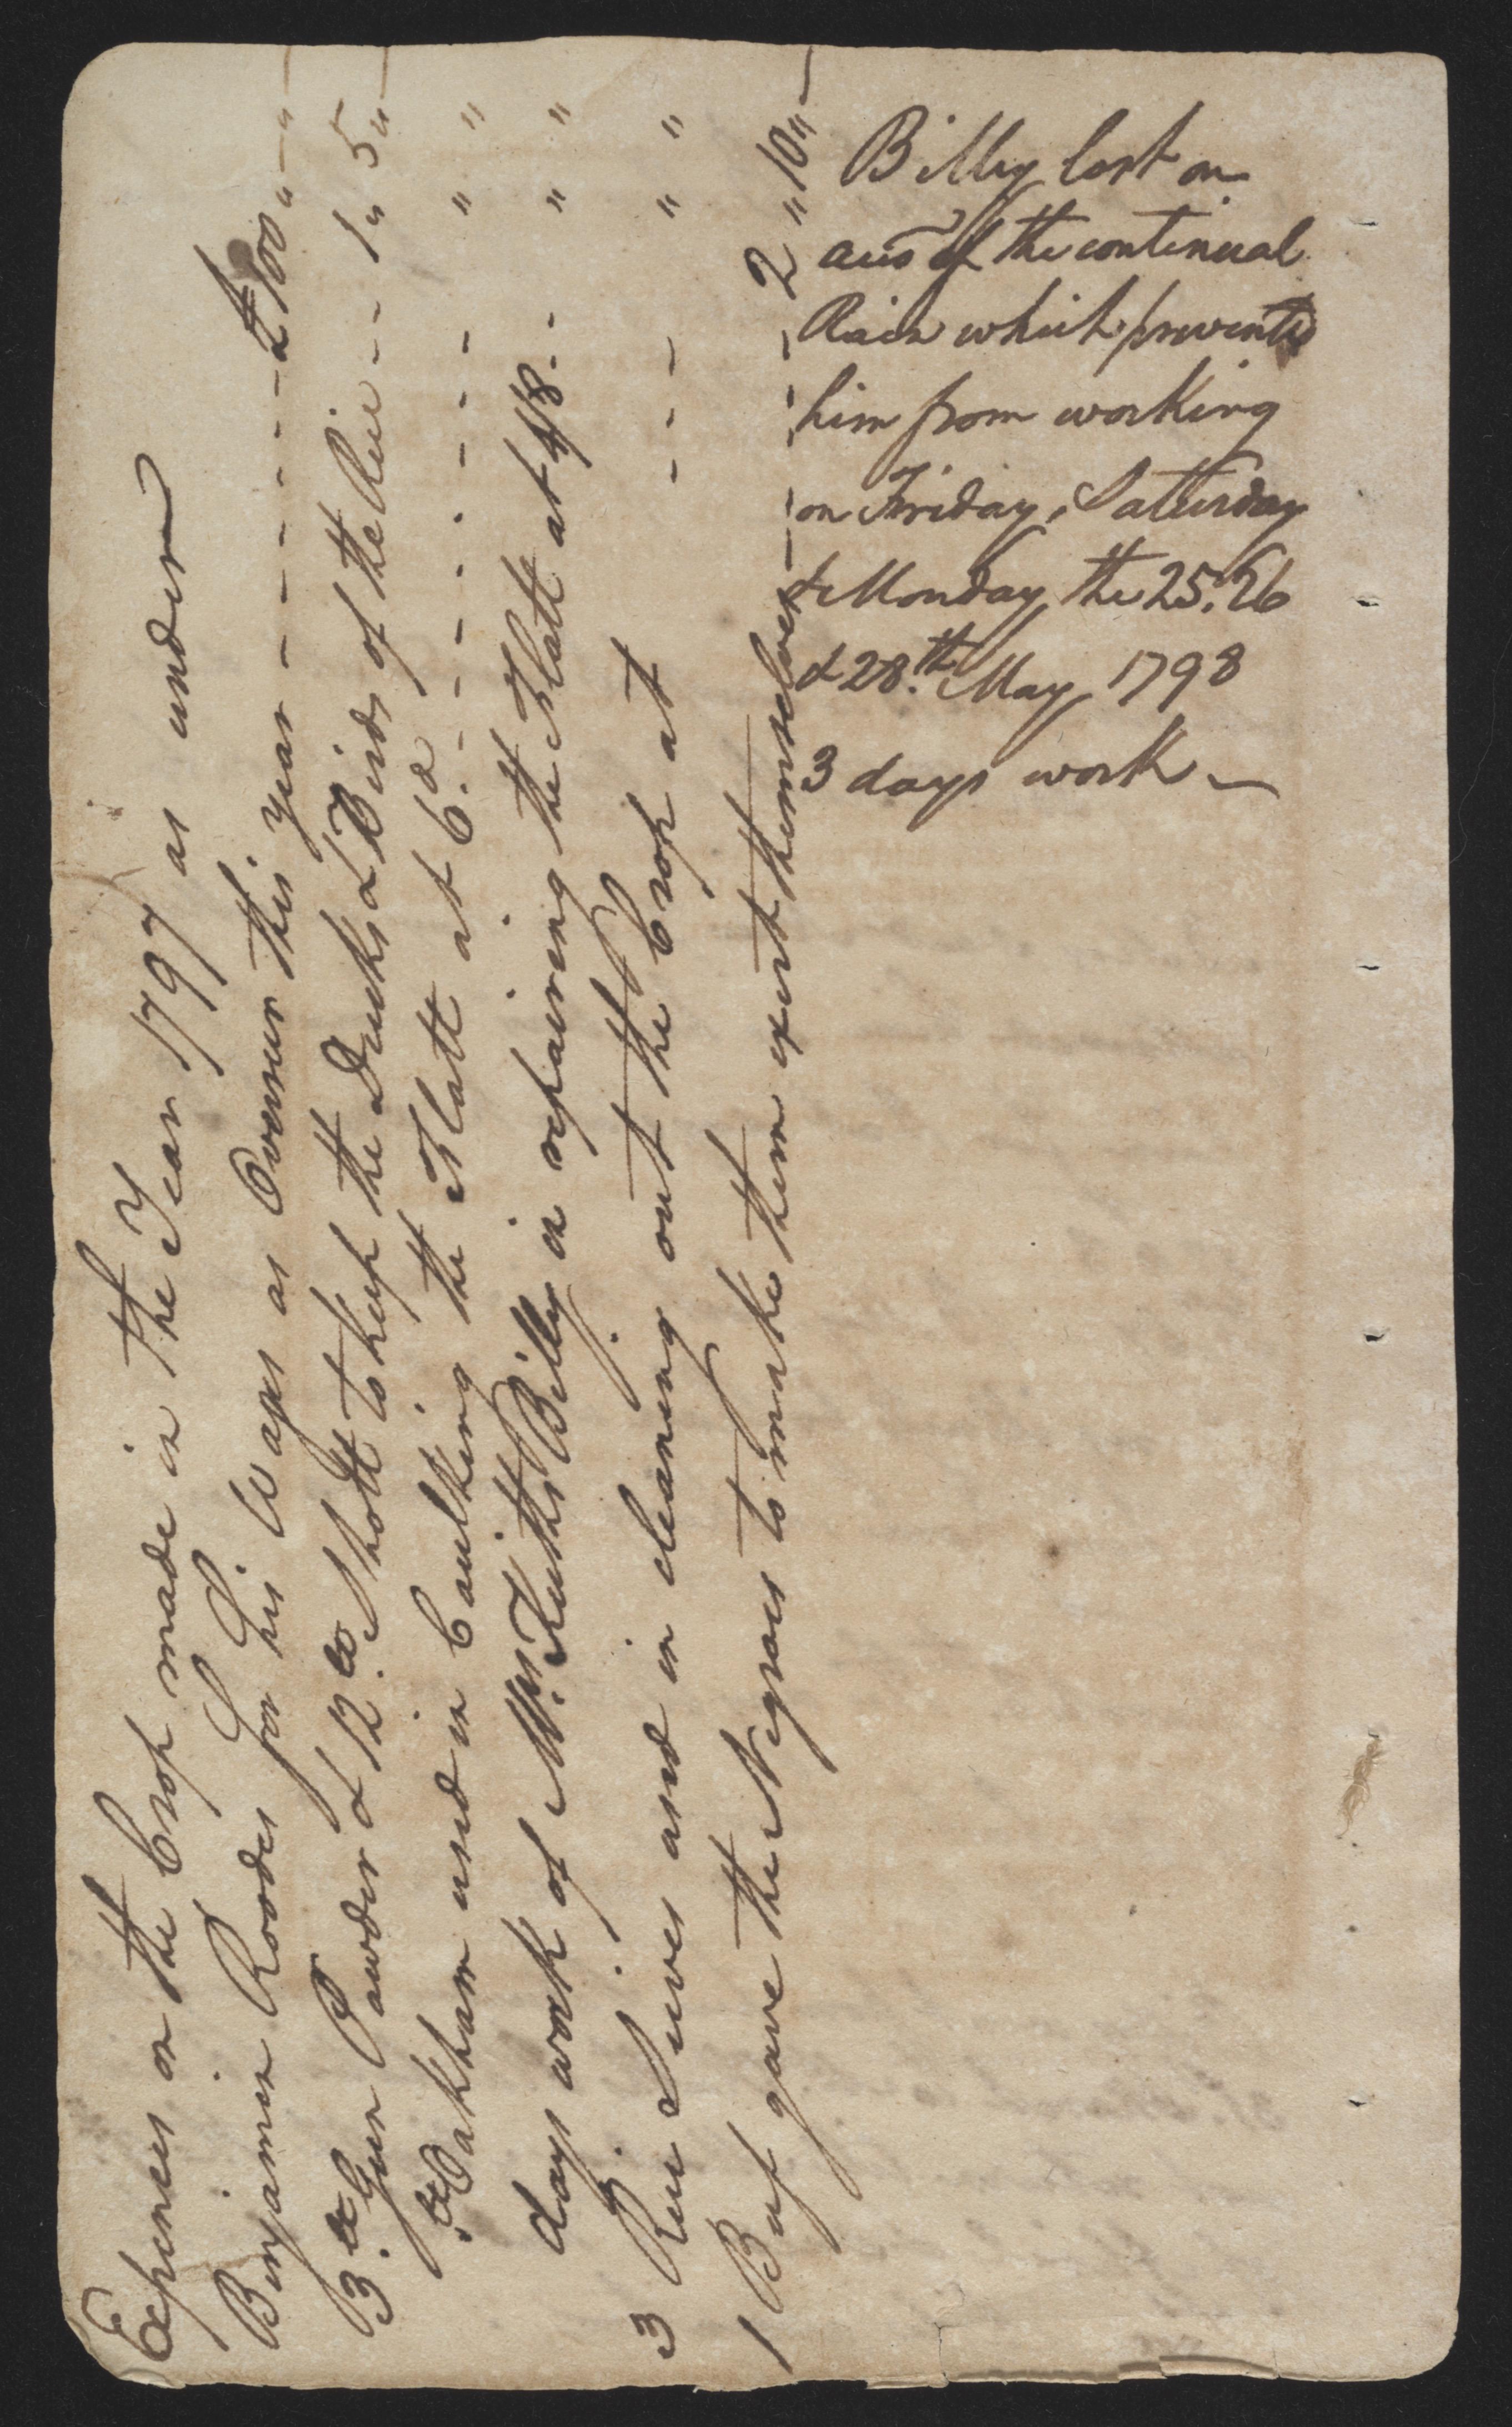 Sandy Island Plantation Journal, Volume 2, 1797, Page 29